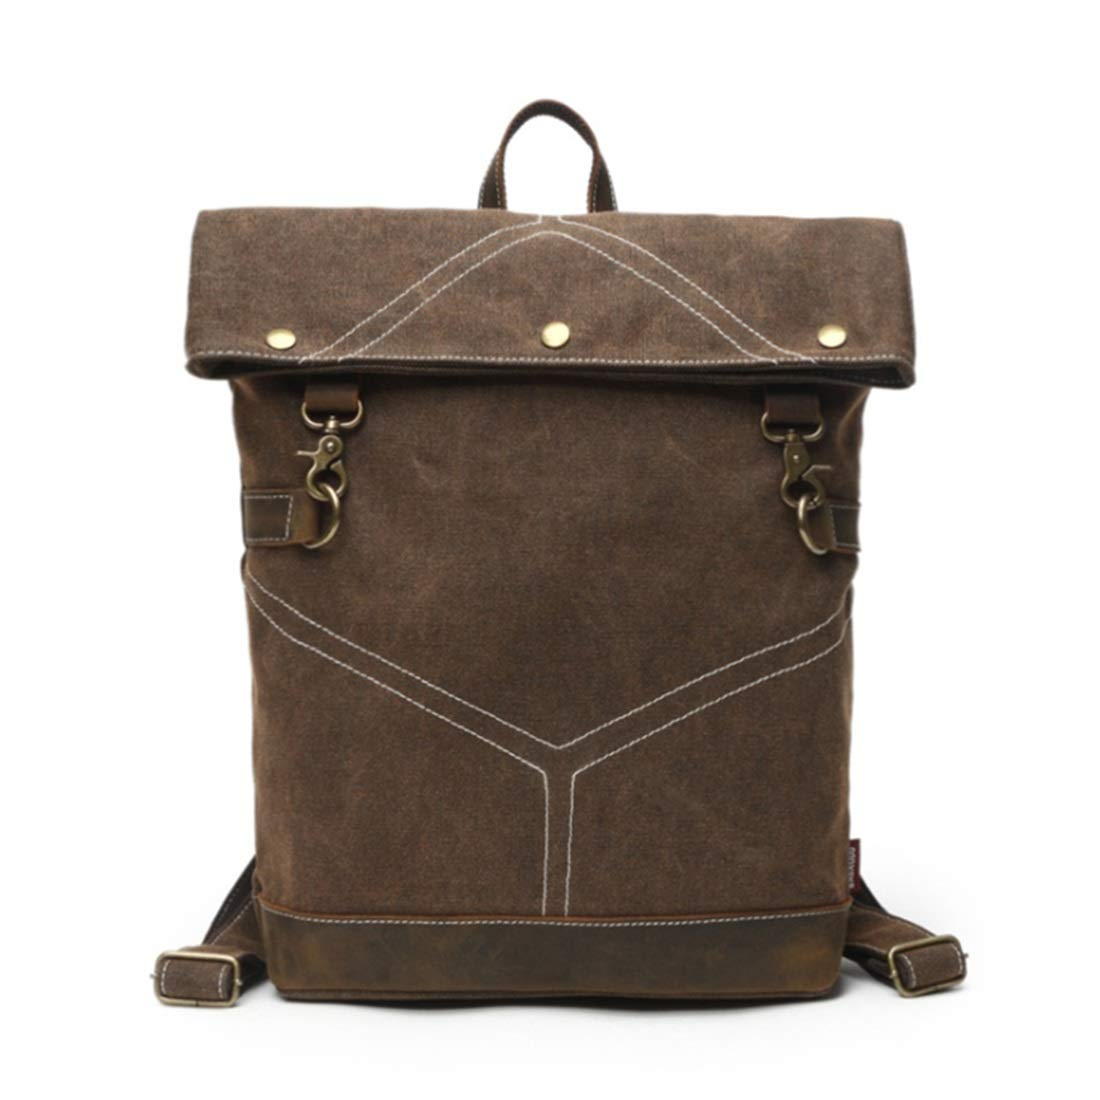 MAGAI Canvas Rucksack Herren und Damen Rucksack Outdoor Bag Bag Bag Retro Bag (Farbe   Gelb) B07MSHRN9Q Daypacks Großer Verkauf ff0479